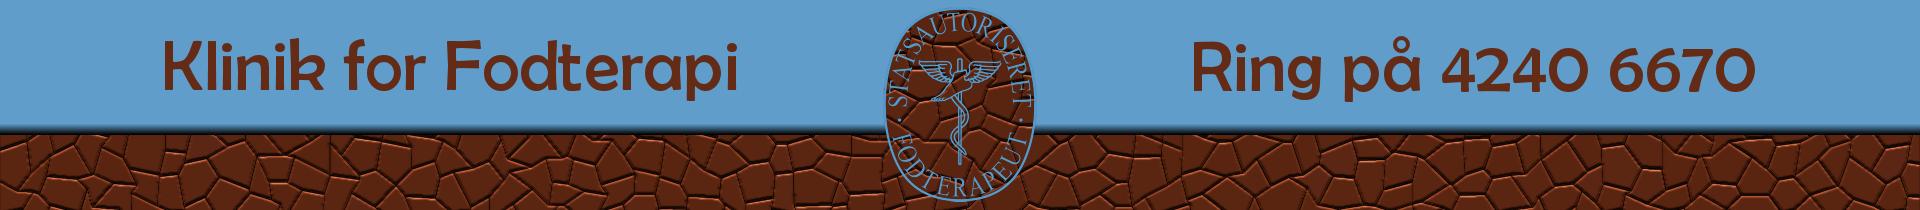 Klinik for Fodterapi v/ Stella Vinding